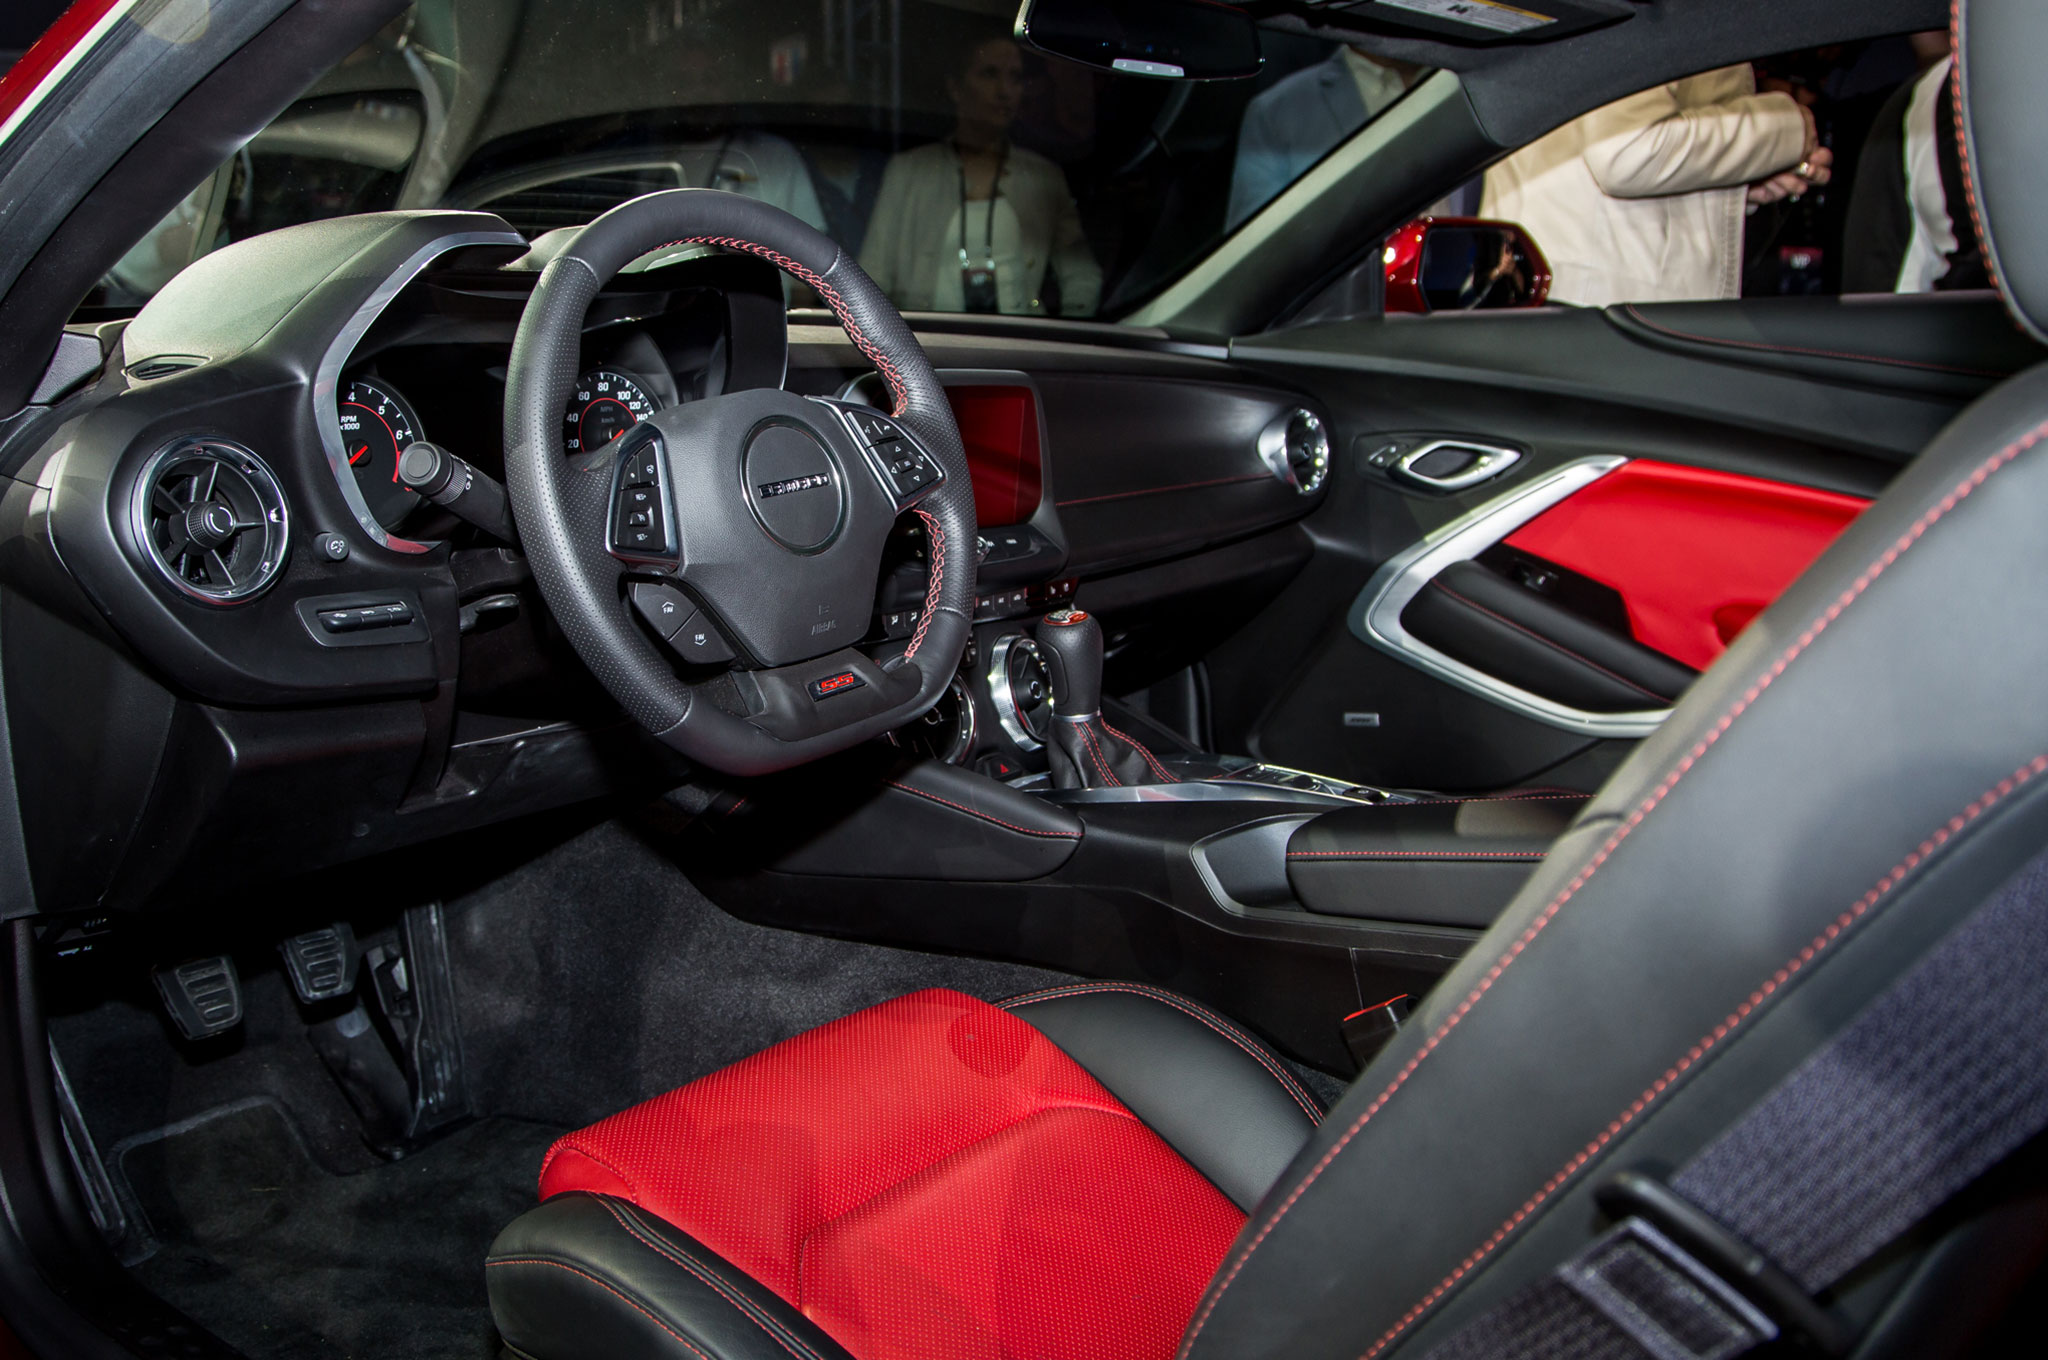 chevrolet camaro 2015 interior. show more chevrolet camaro 2015 interior o